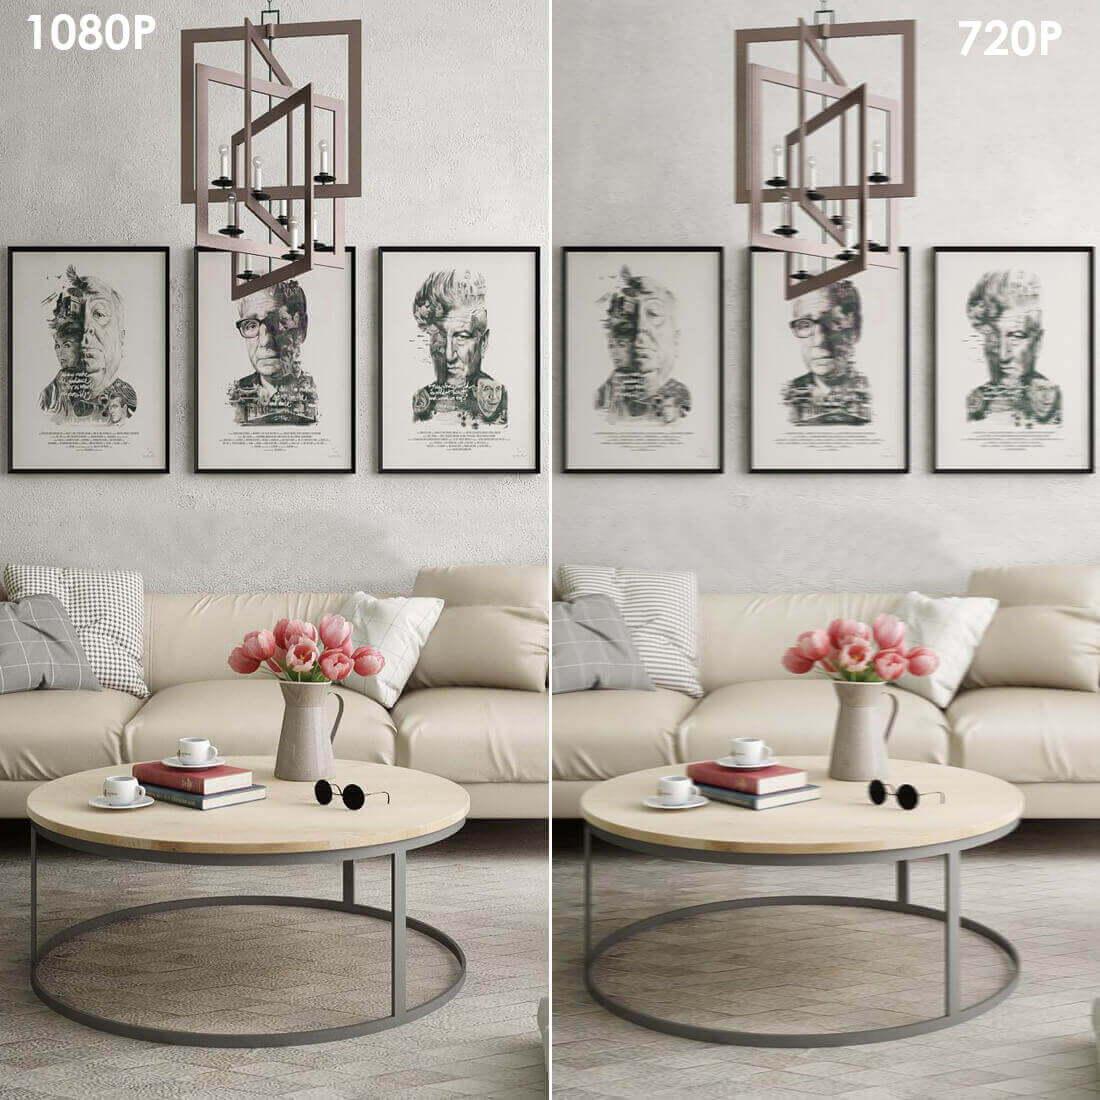 Full 1080p high definition, captures details.